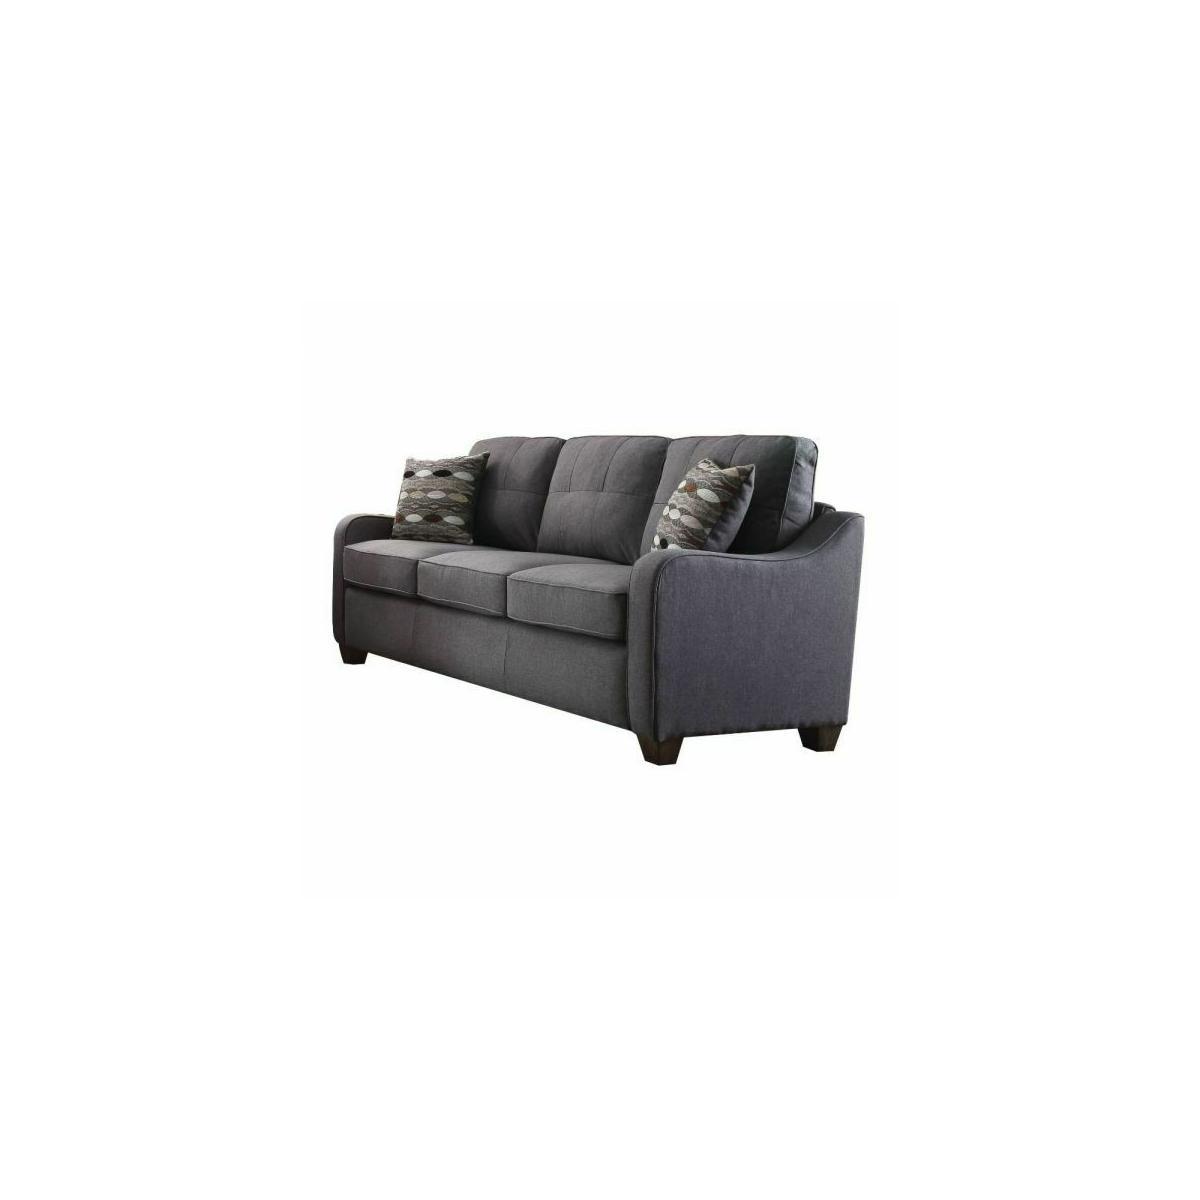 See Details - Cleavon II Sofa